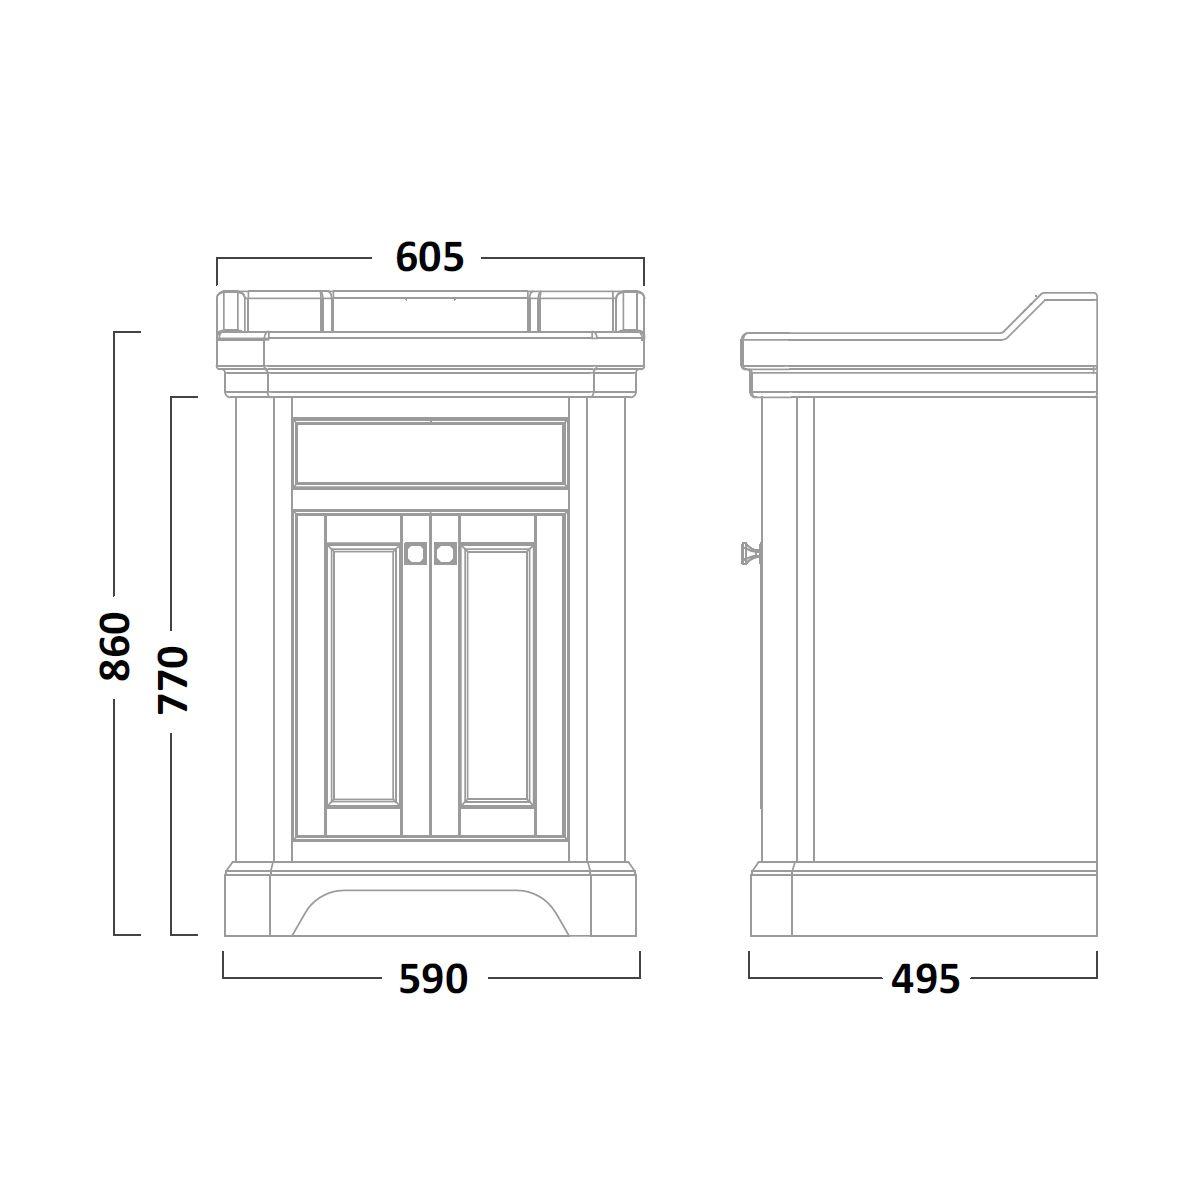 Tavistock Vitoria Vanity Unit & Two Tap Hole Basin White 600mm Dimensions